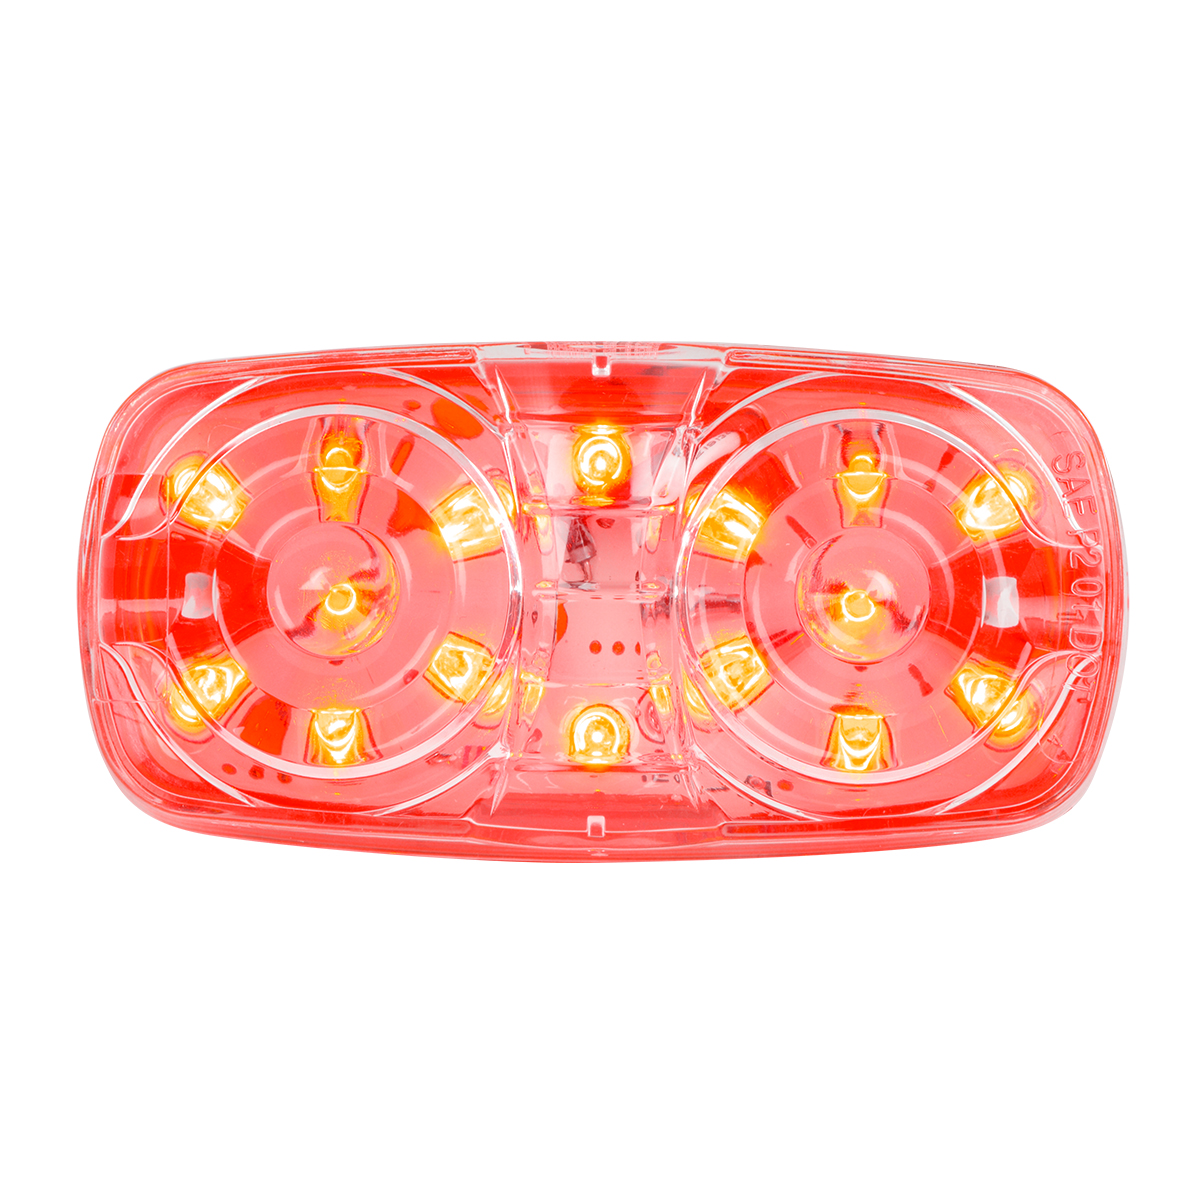 85243 Tiger Eye LED Marker Light in Amber/Amber